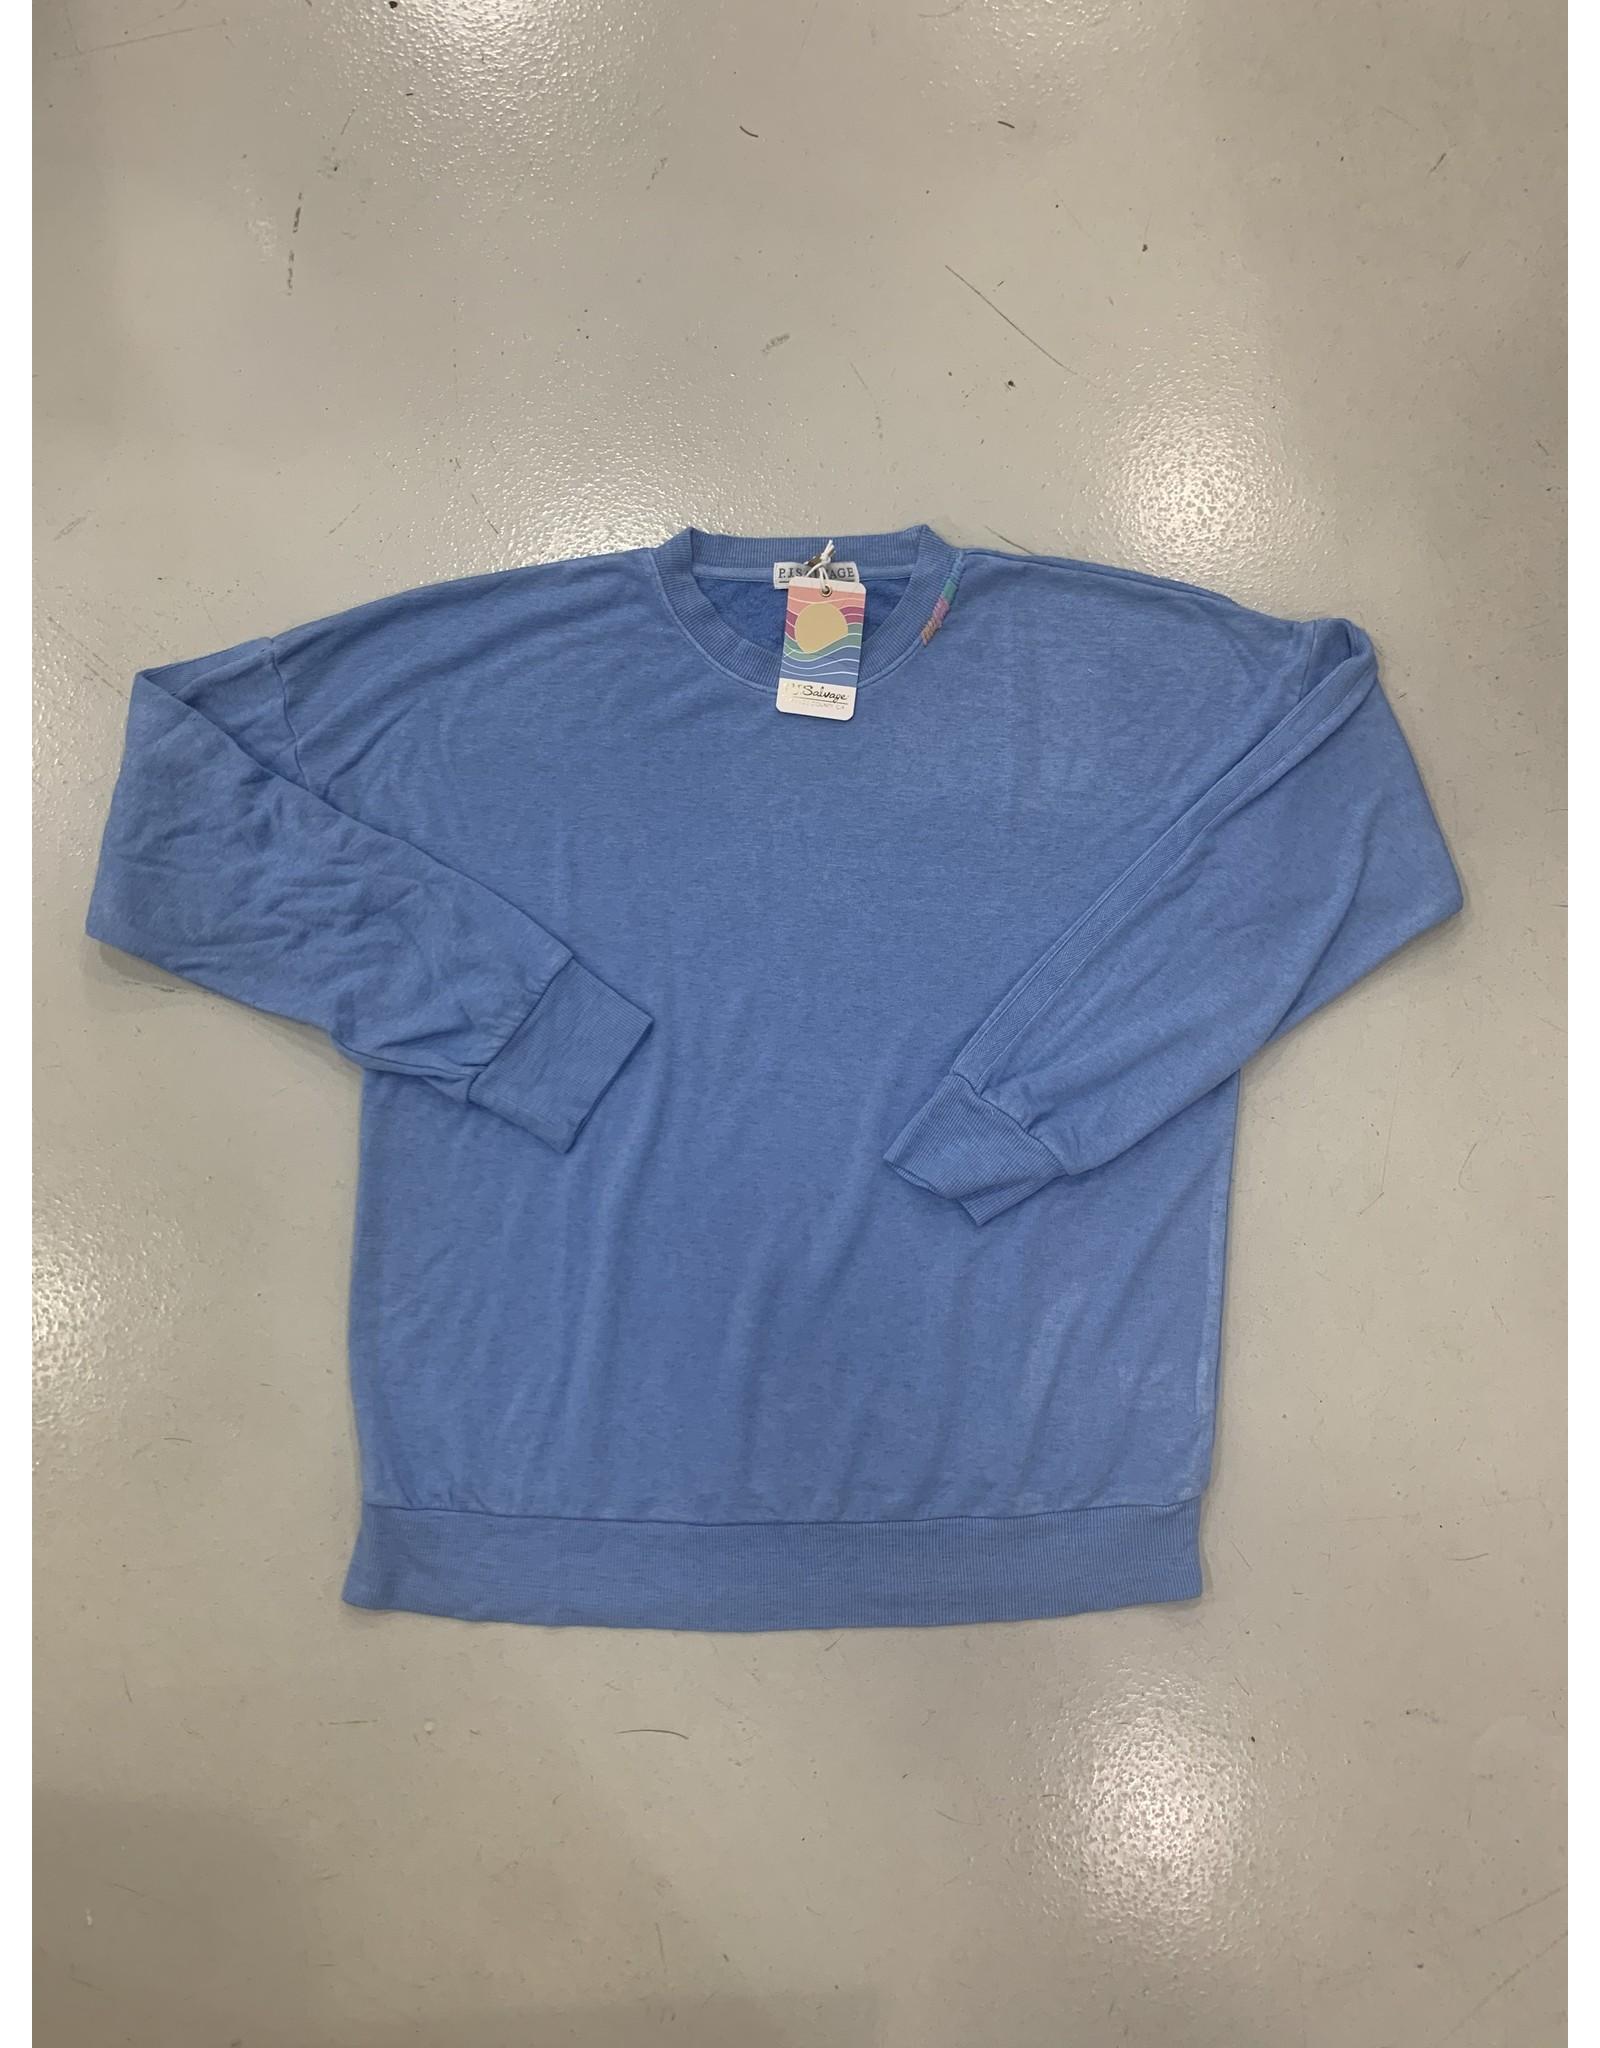 PJ Salvage PJ Salvage Long Sleeve Top